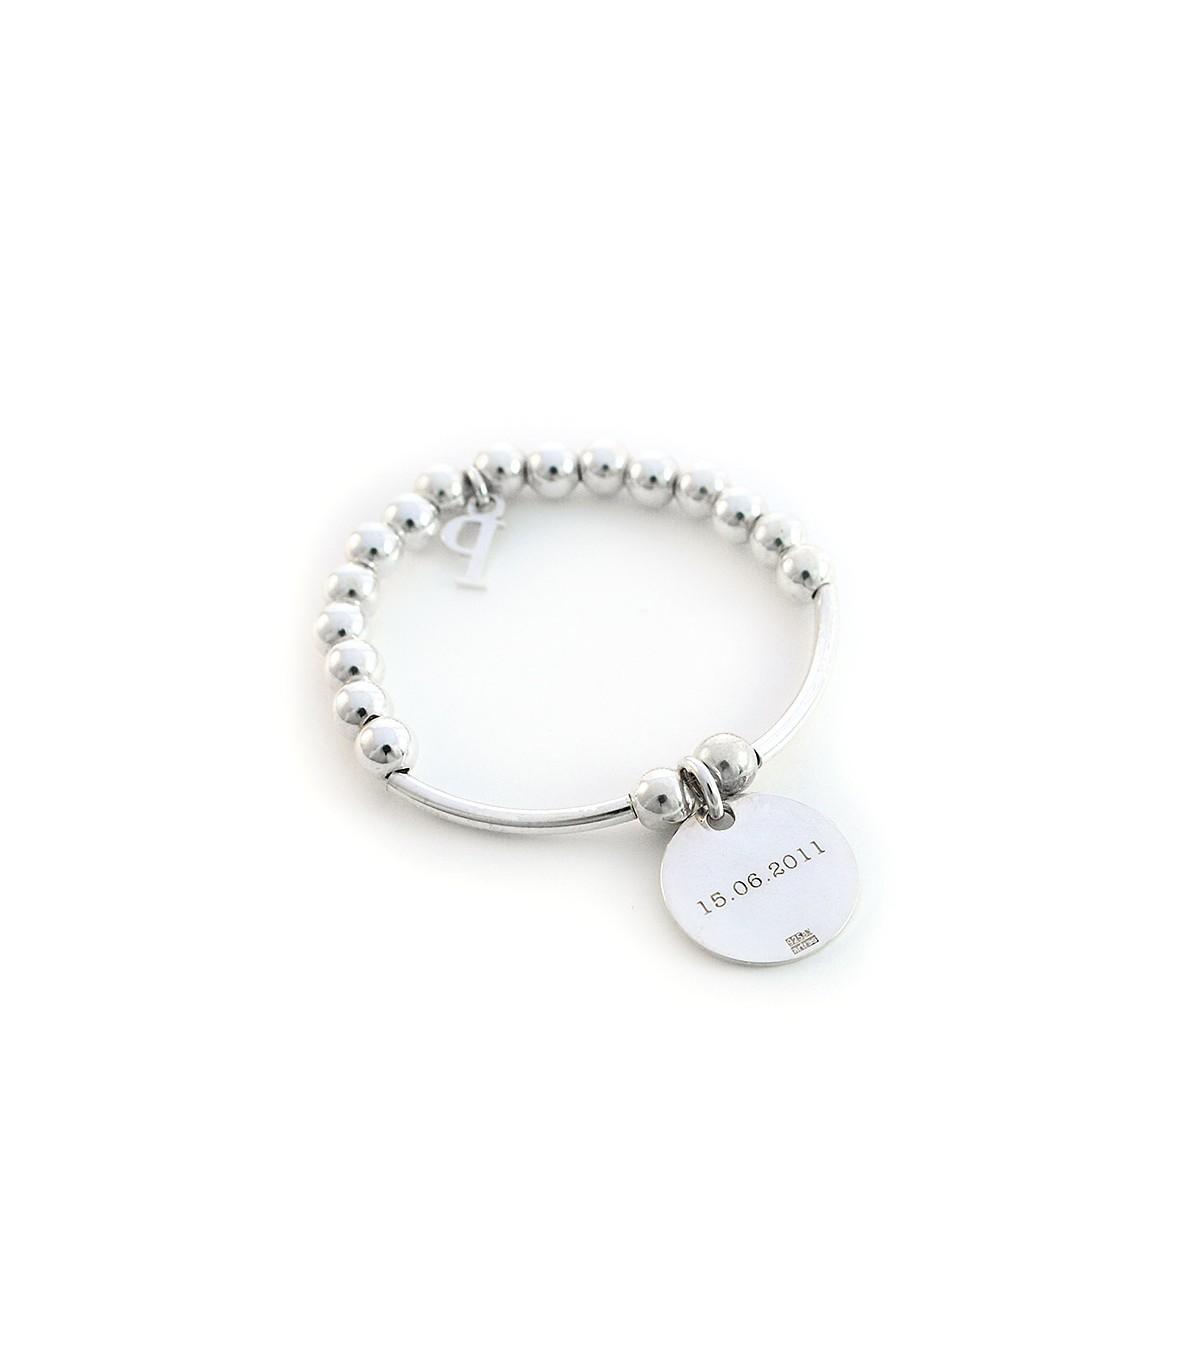 af60b669ddd6 Pulseras de plata personalizadas con nombres para niñas – Bambina ...